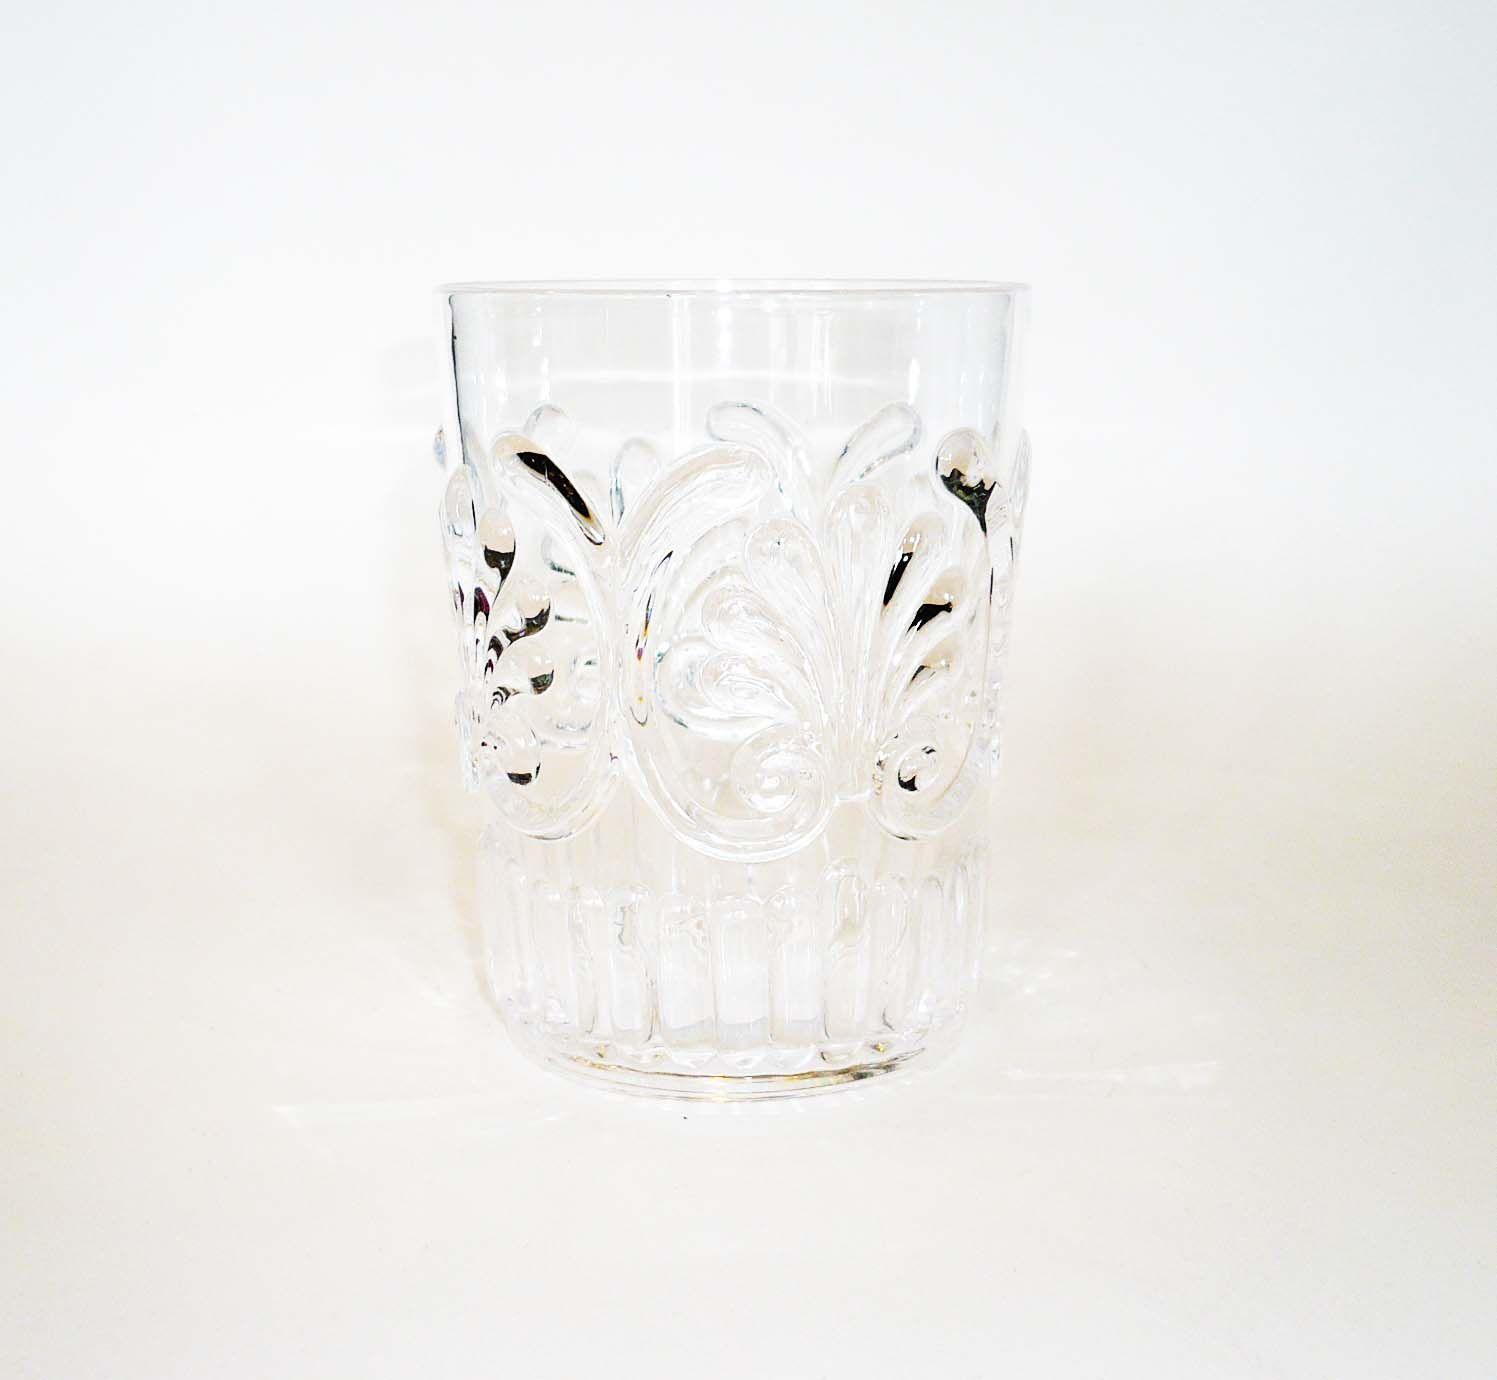 clear plastic drinking glasses dishwasher safe plastic drinking glasses clear